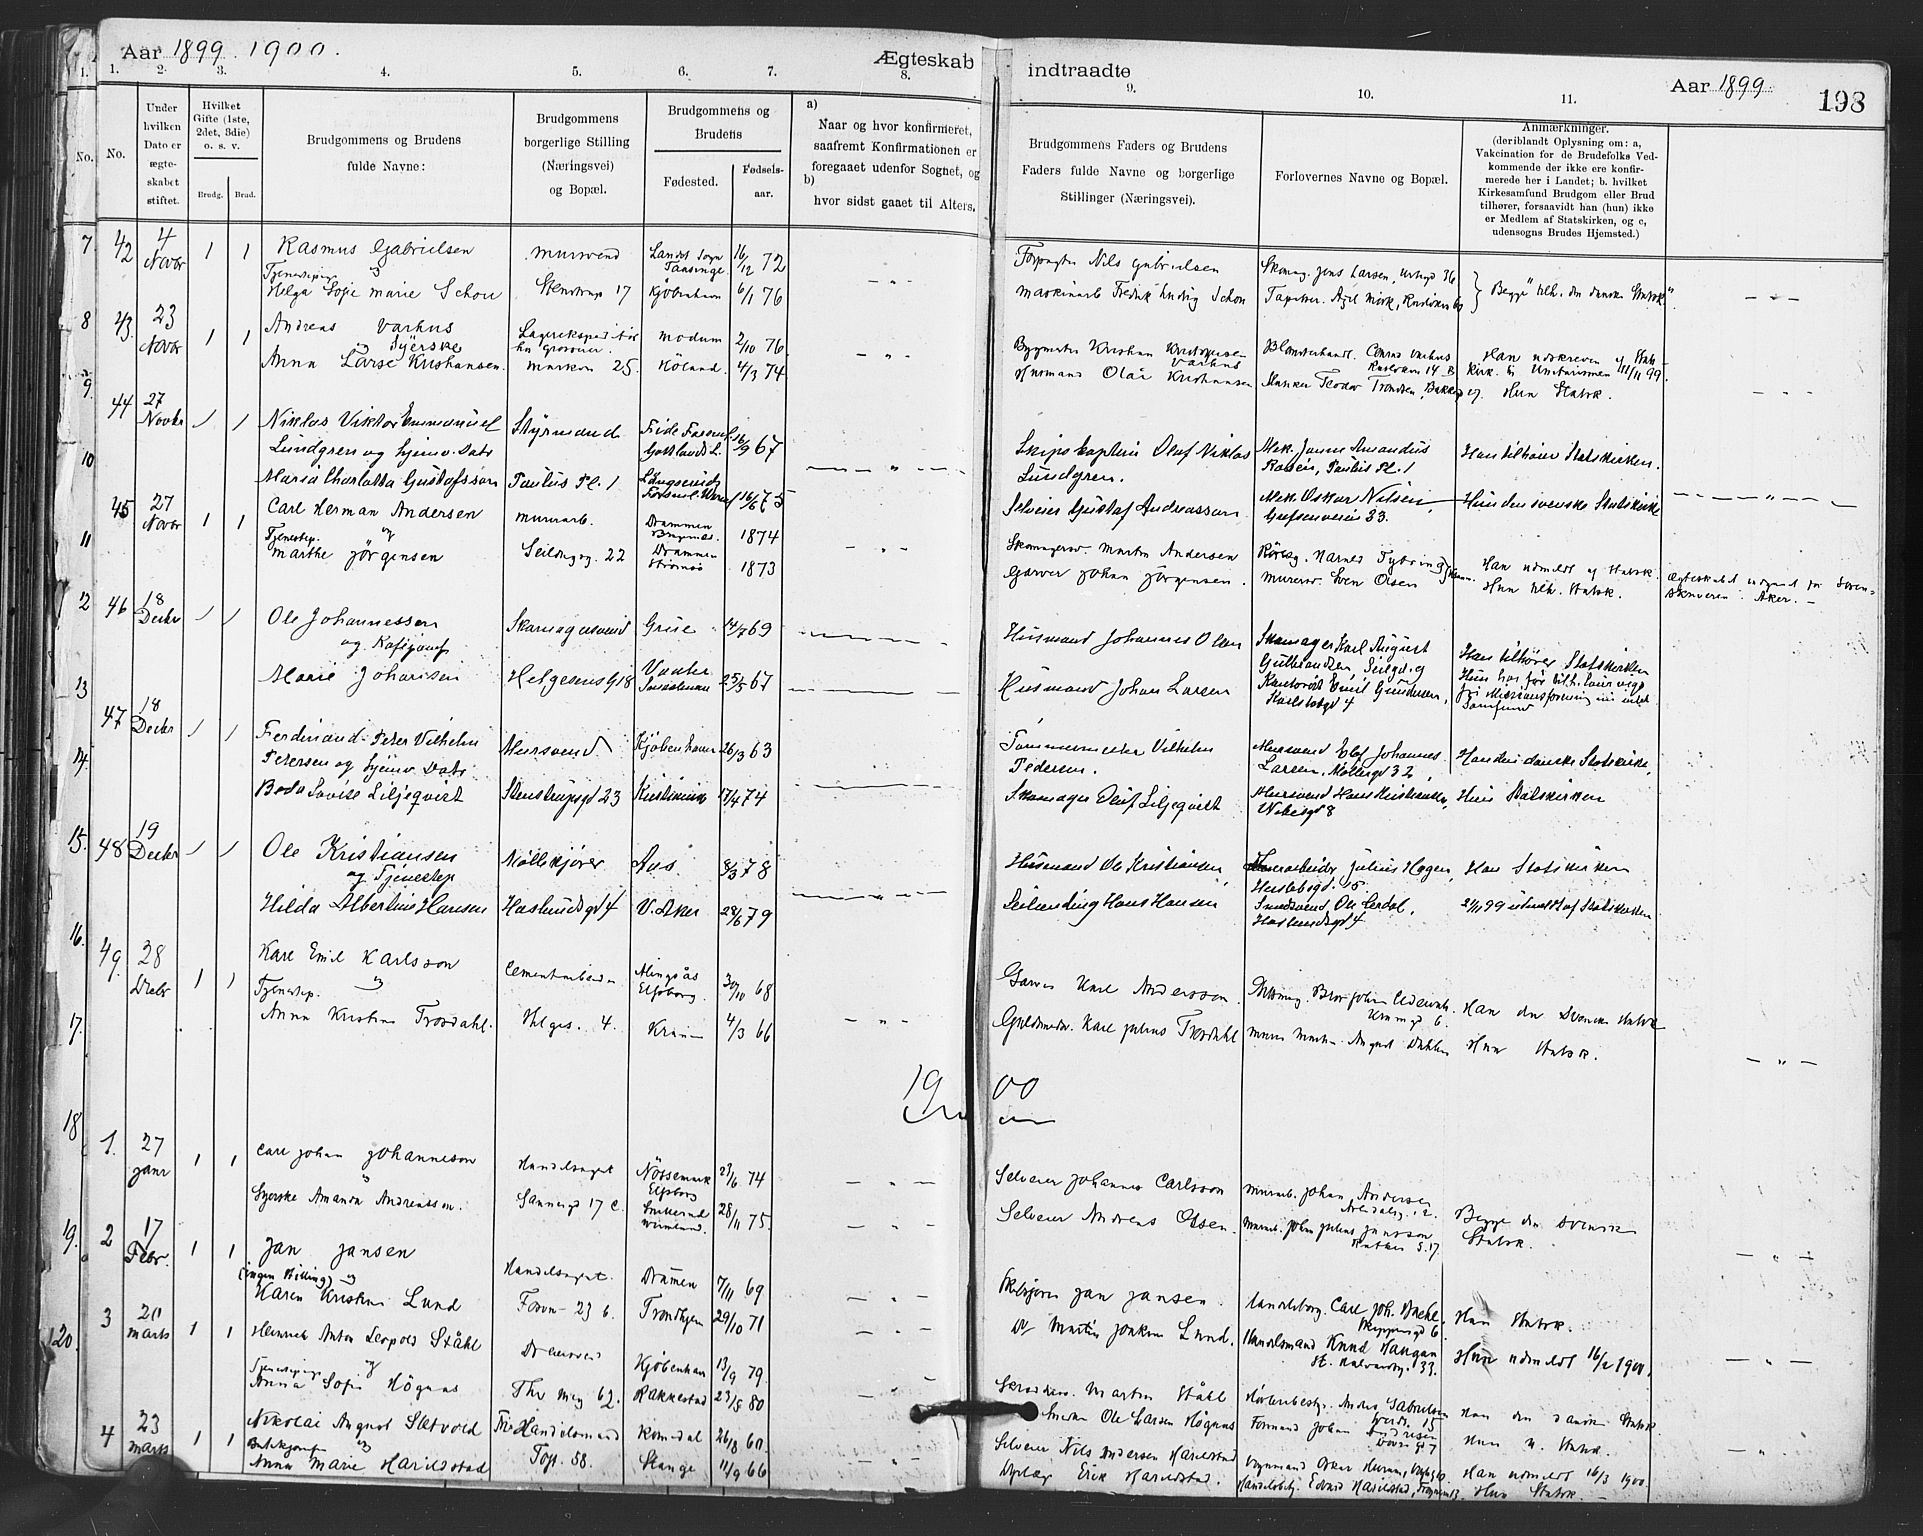 SAO, Paulus prestekontor Kirkebøker, F/Fa/L0012: Ministerialbok nr. 12, 1897-1908, s. 198